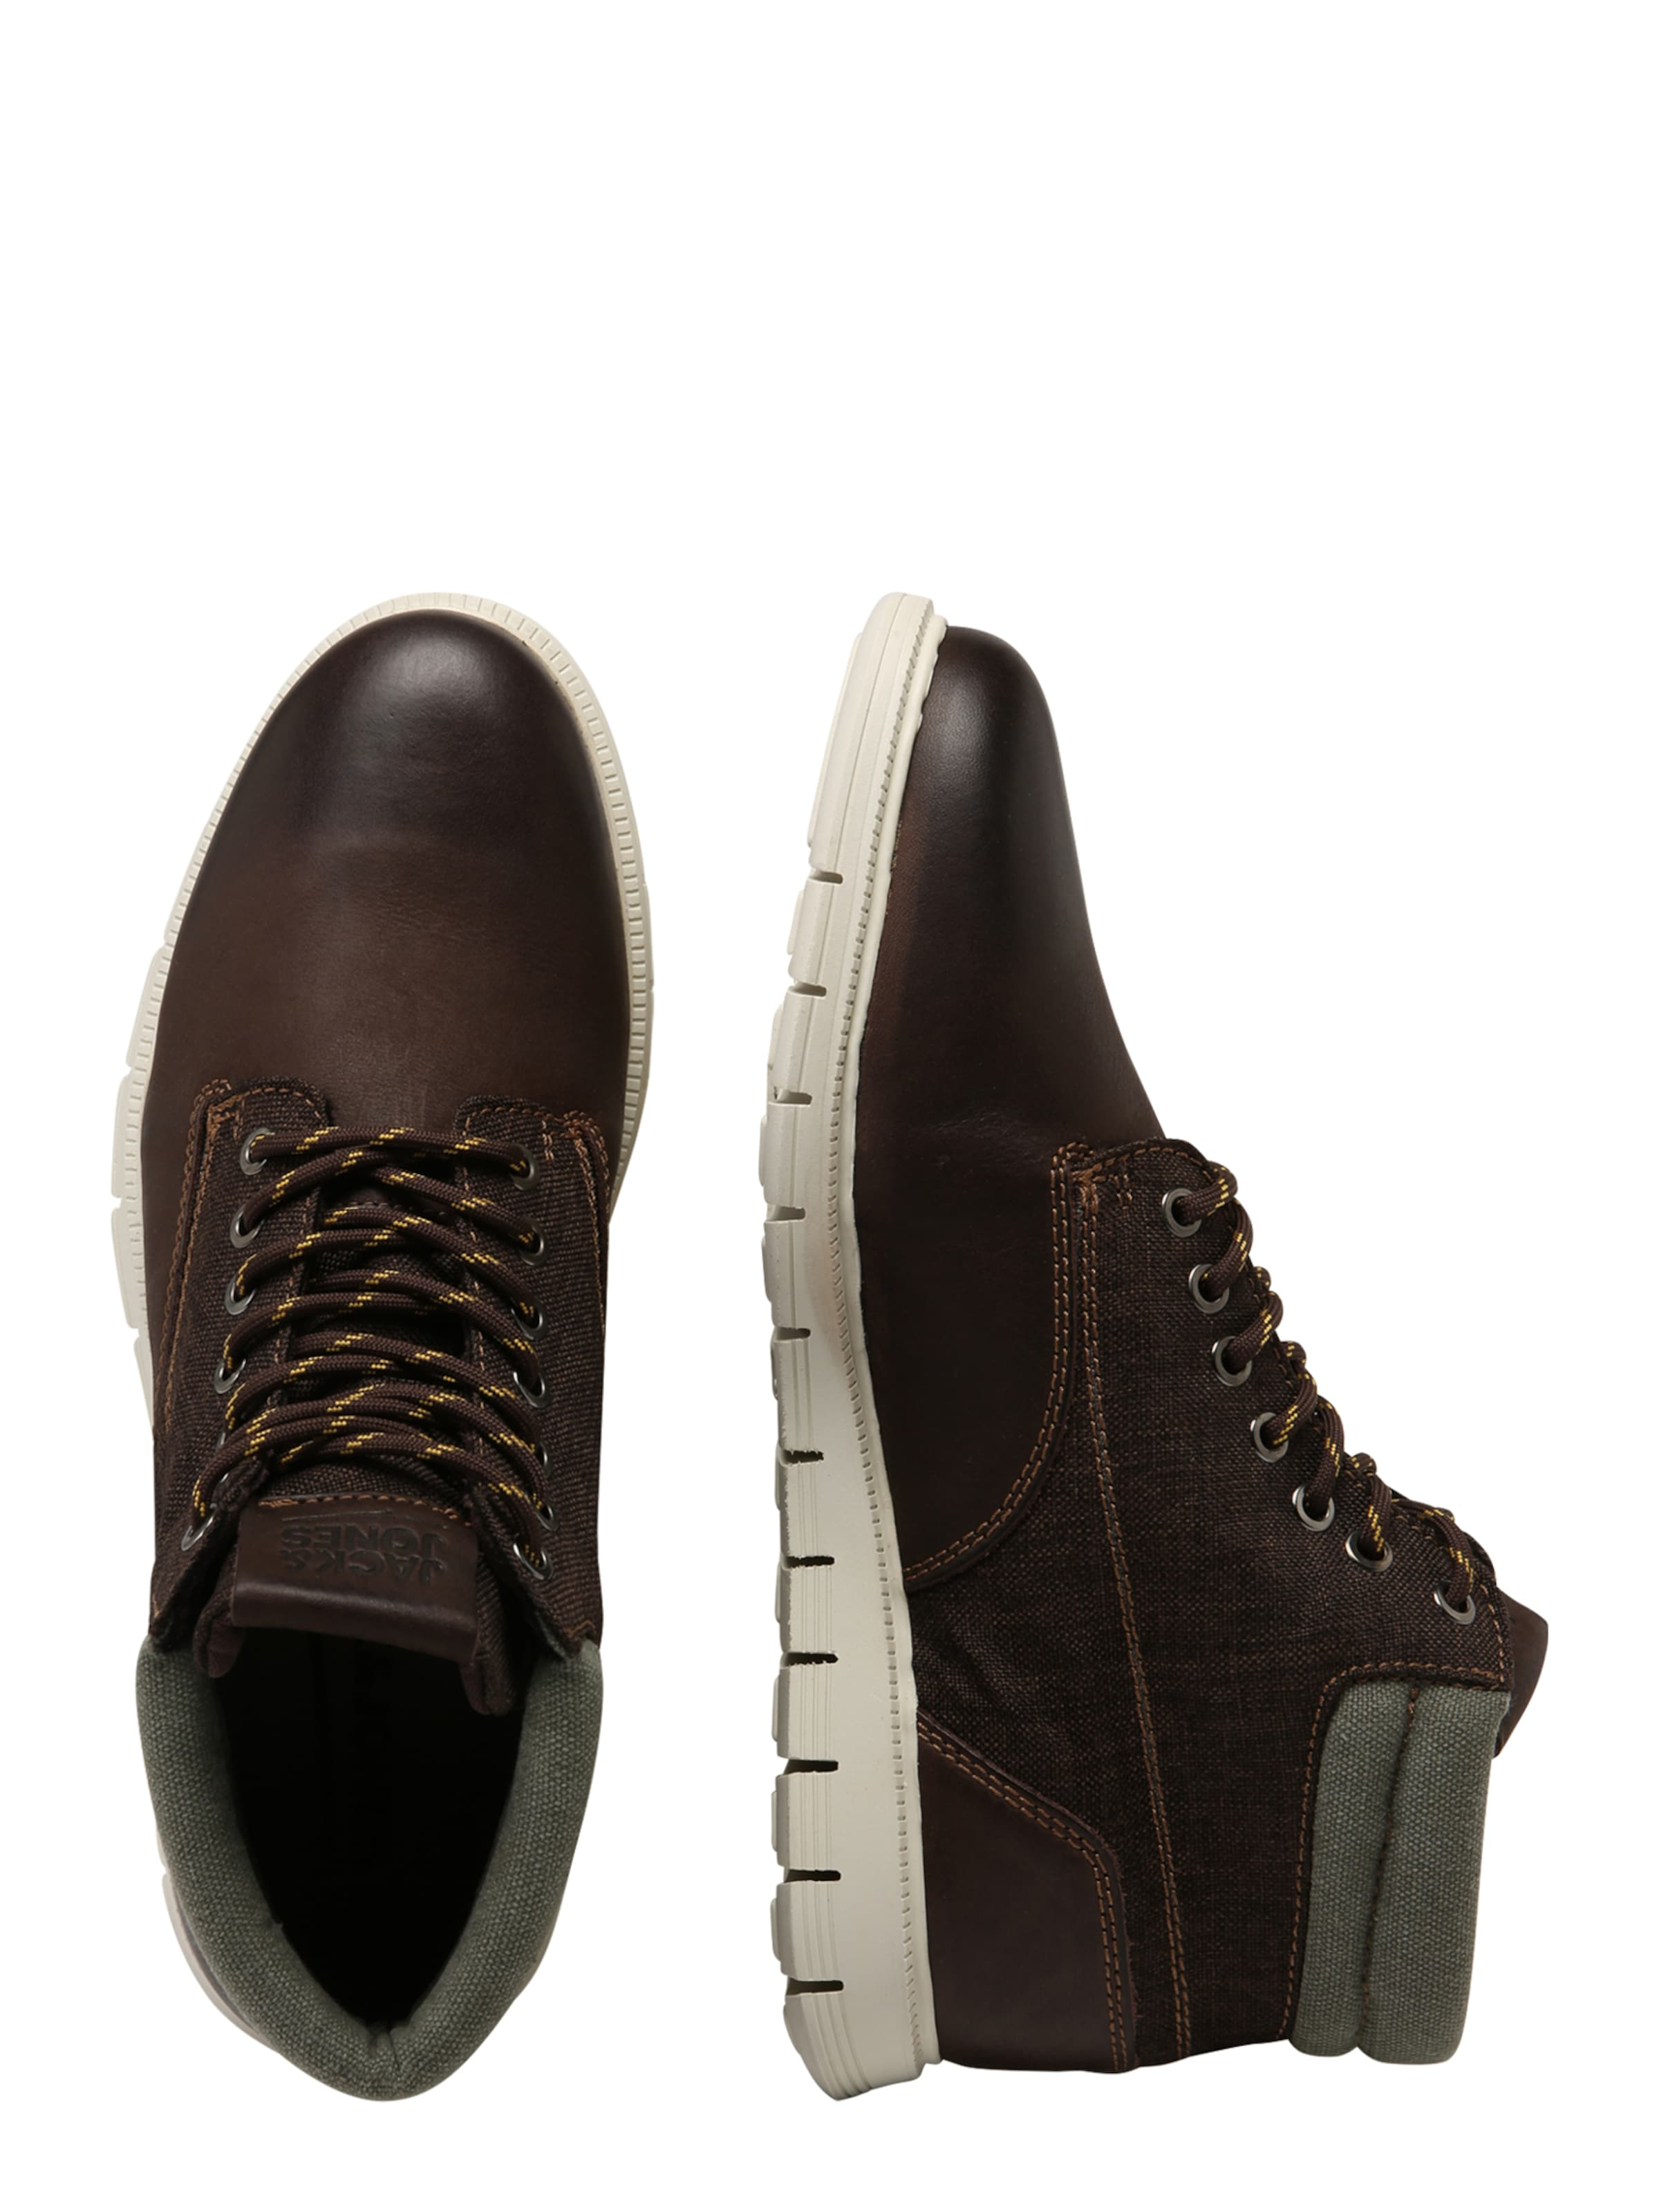 Stiefel In Jones Boot' 'jfwpedro Leather Dunkelbraun Jackamp; 4AjLq3R5